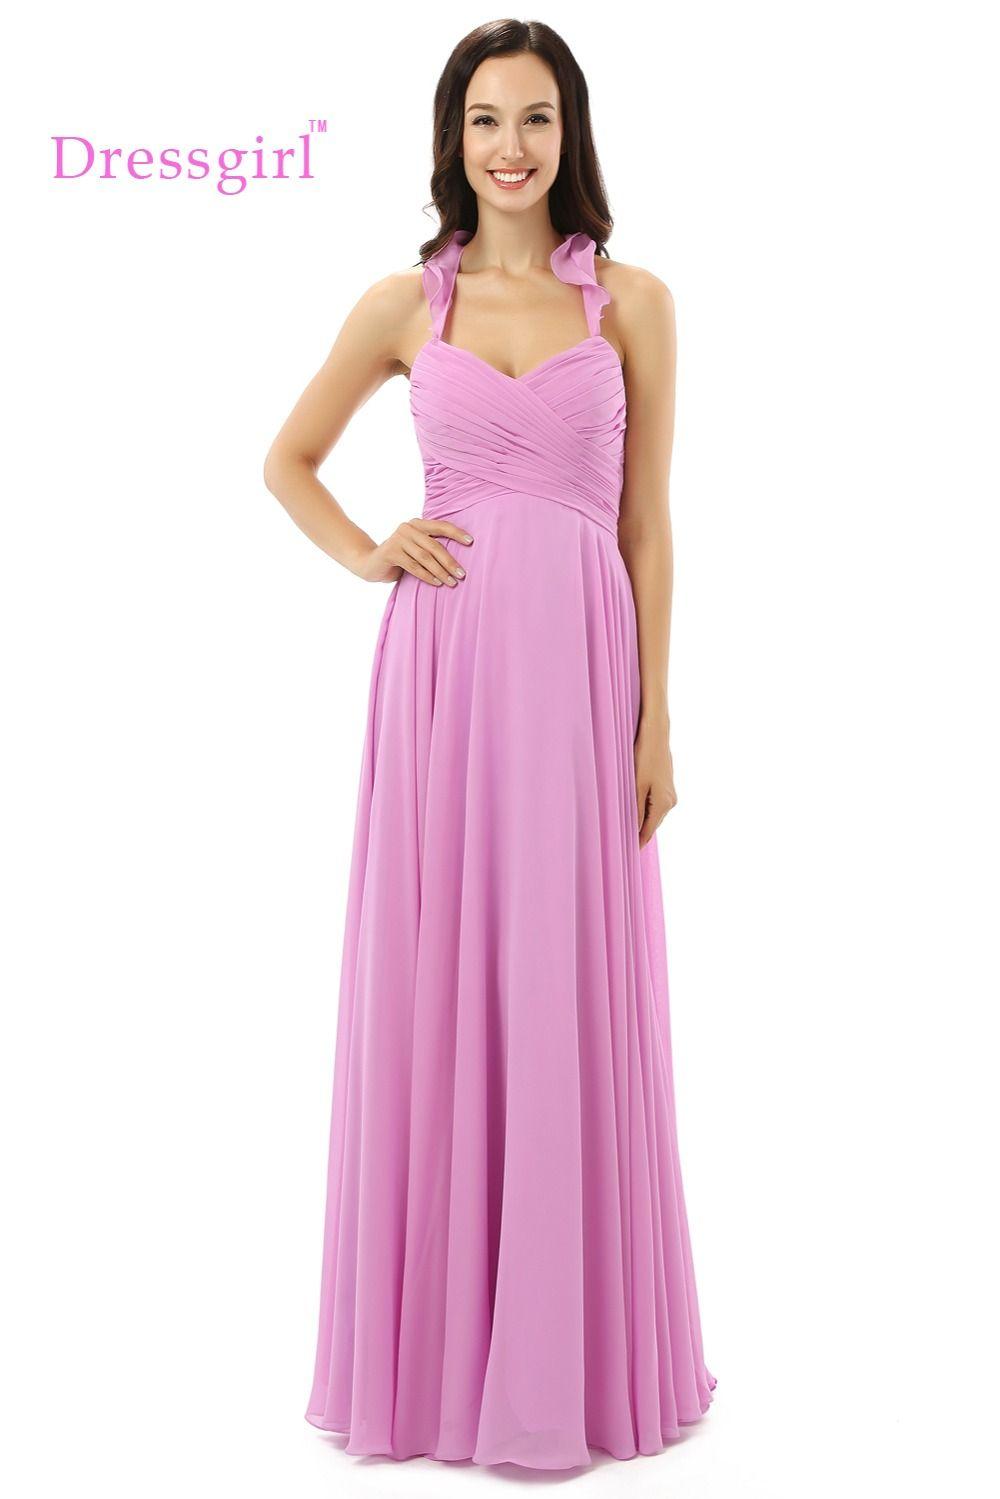 Fancy buy cheap bridesmaid dresses under 50 composition wedding cheap bridesmaids dresses under 50 images braidsmaid dress ombrellifo Gallery